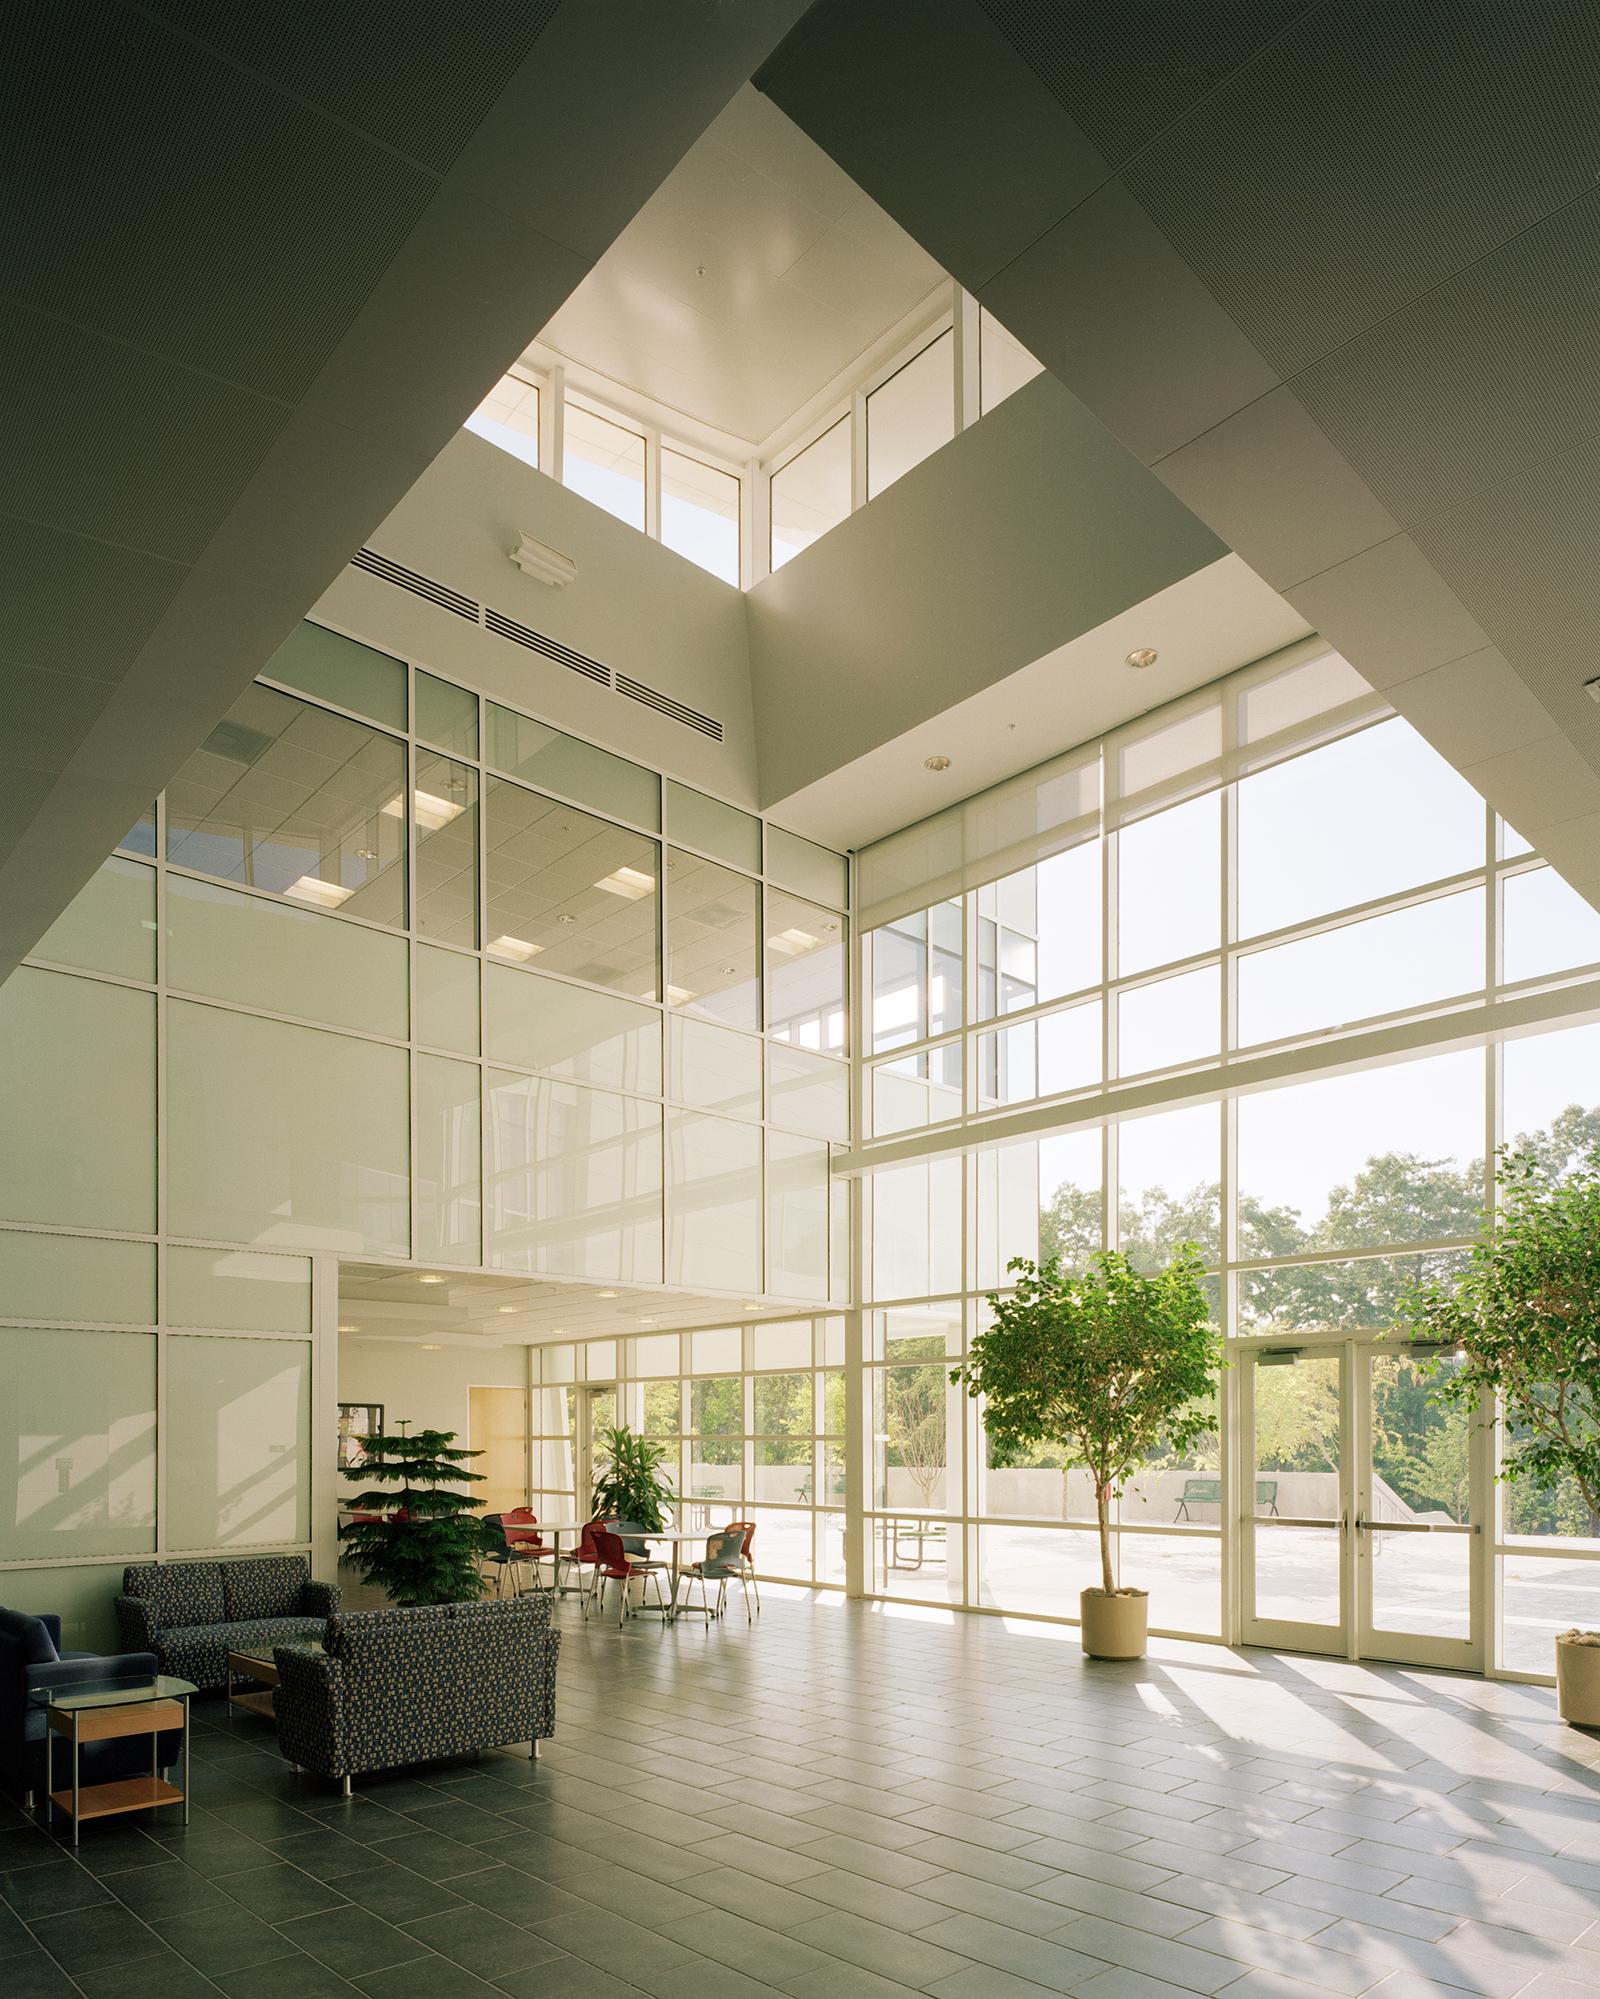 Riverstone_Research_Building-South Boston.Virginia_1600.jpg